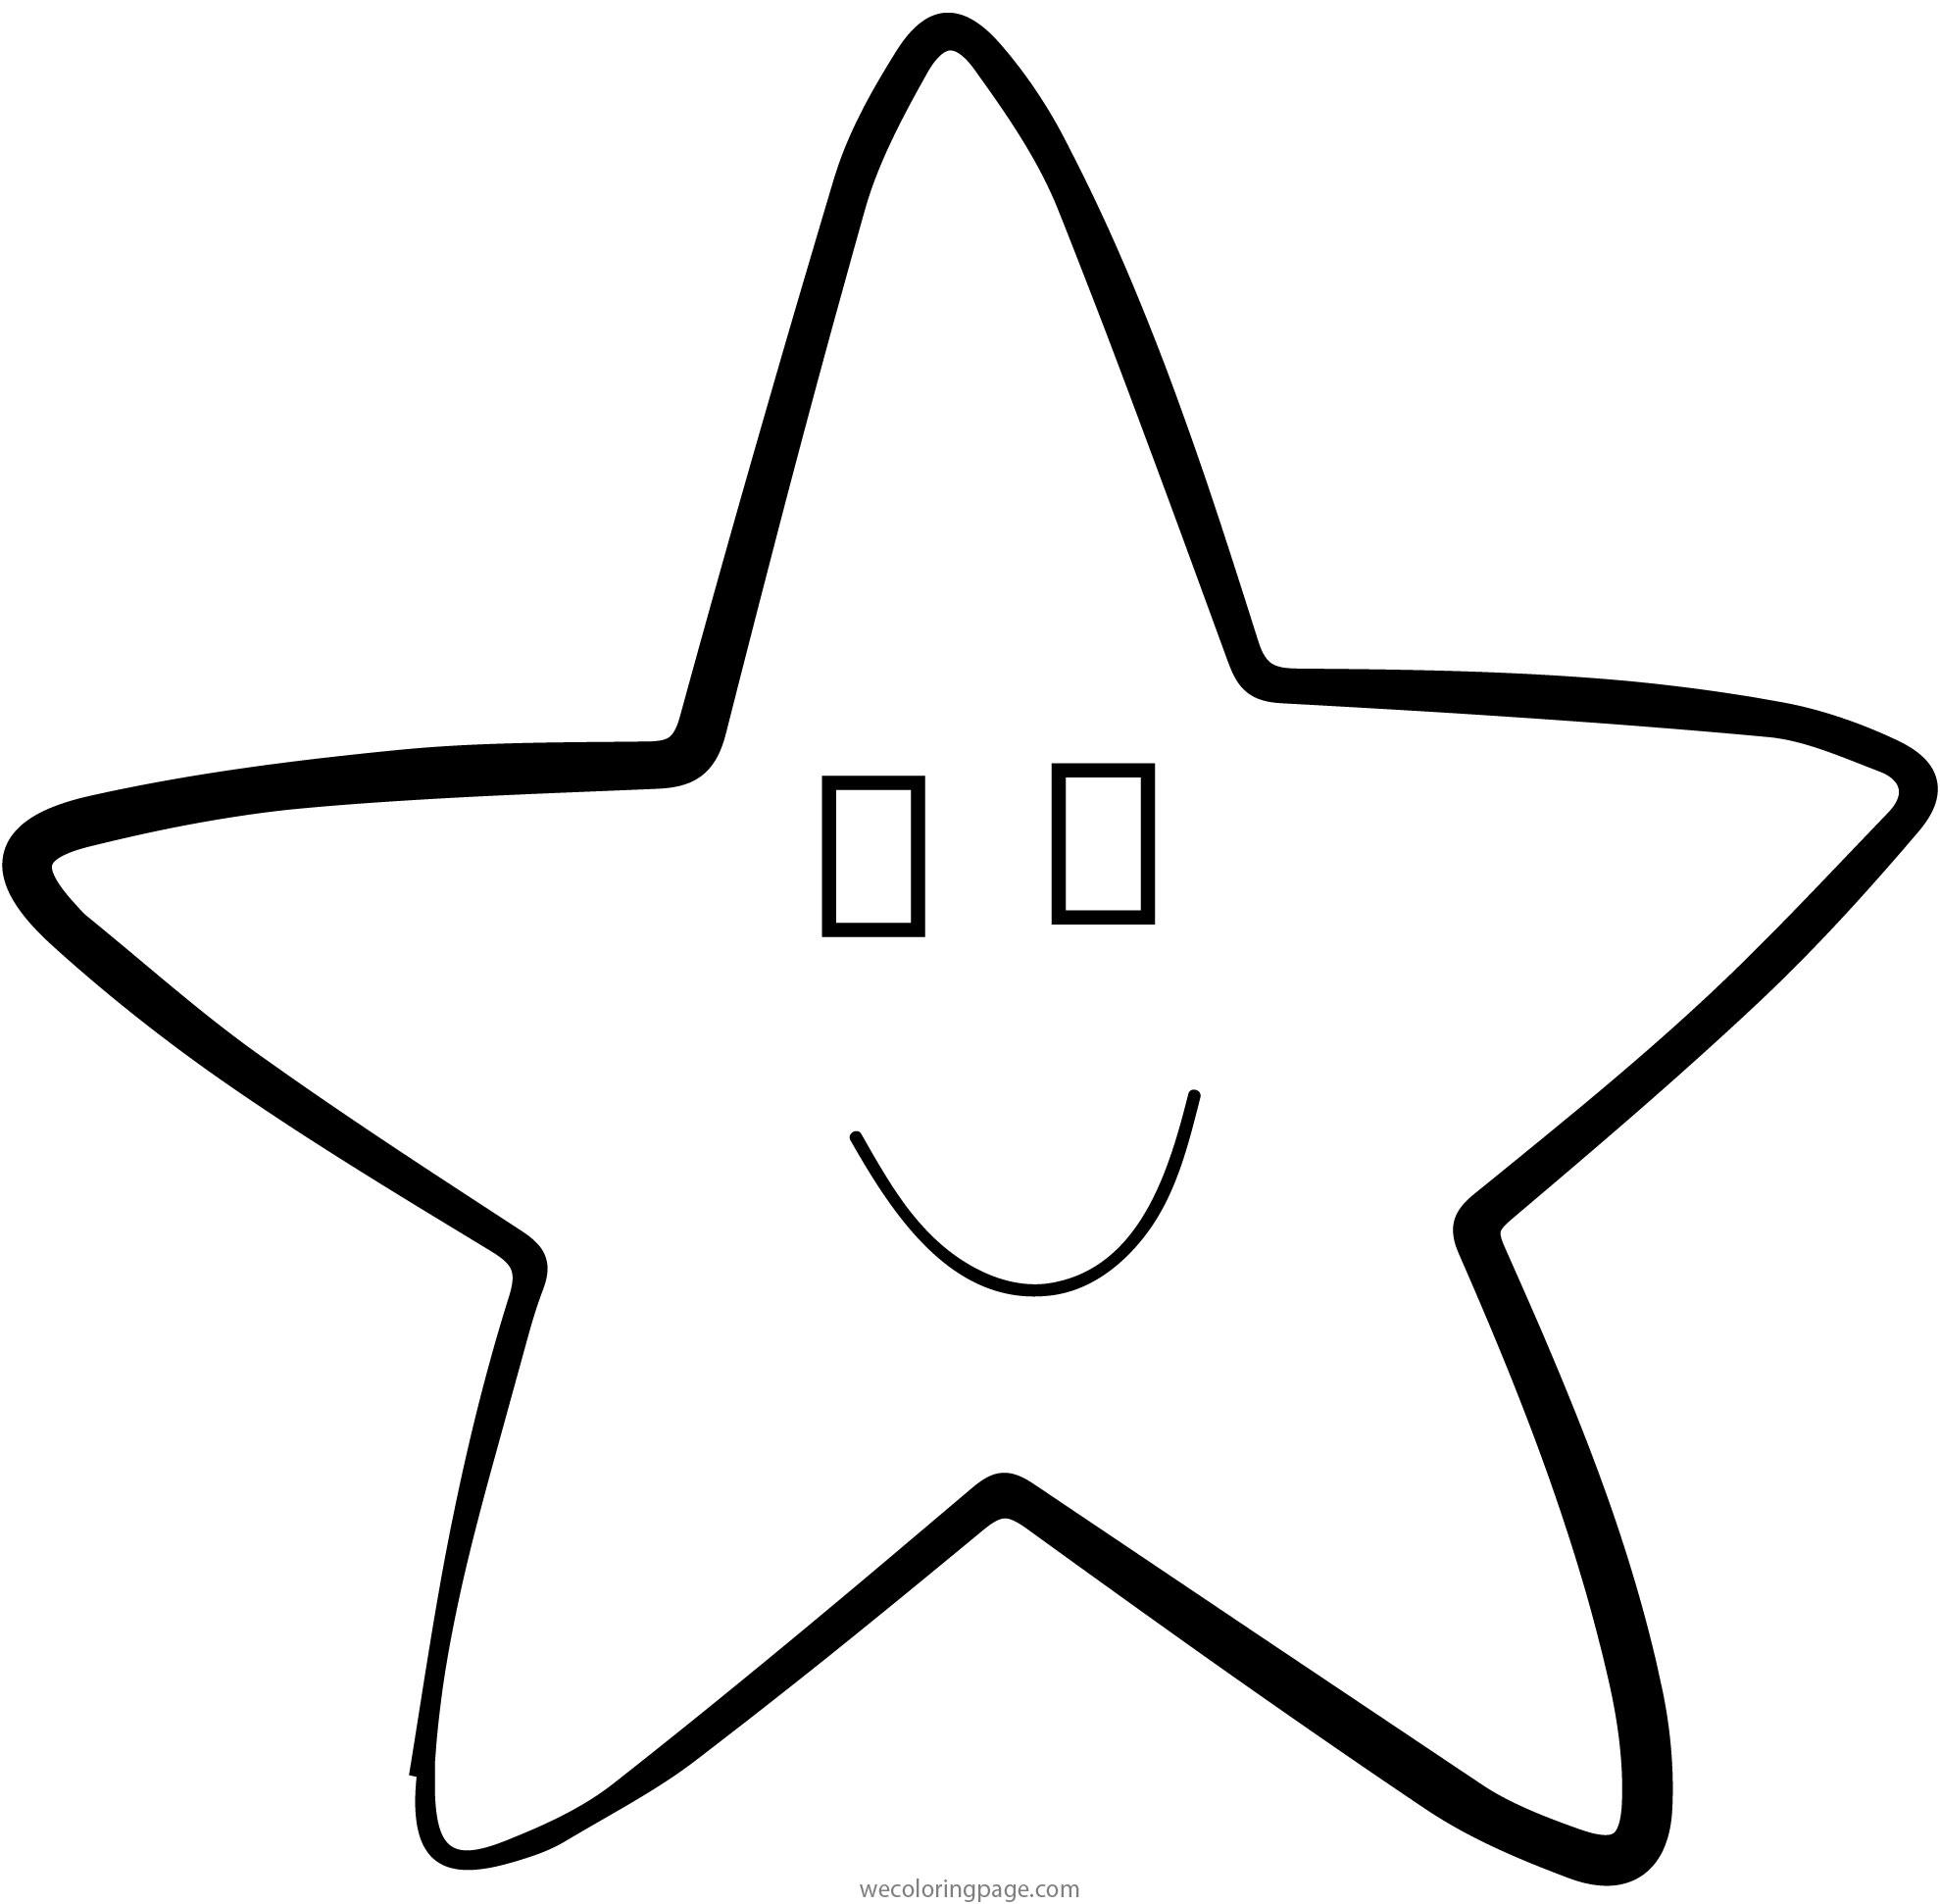 Star Rectrangle Eye Coloring Page